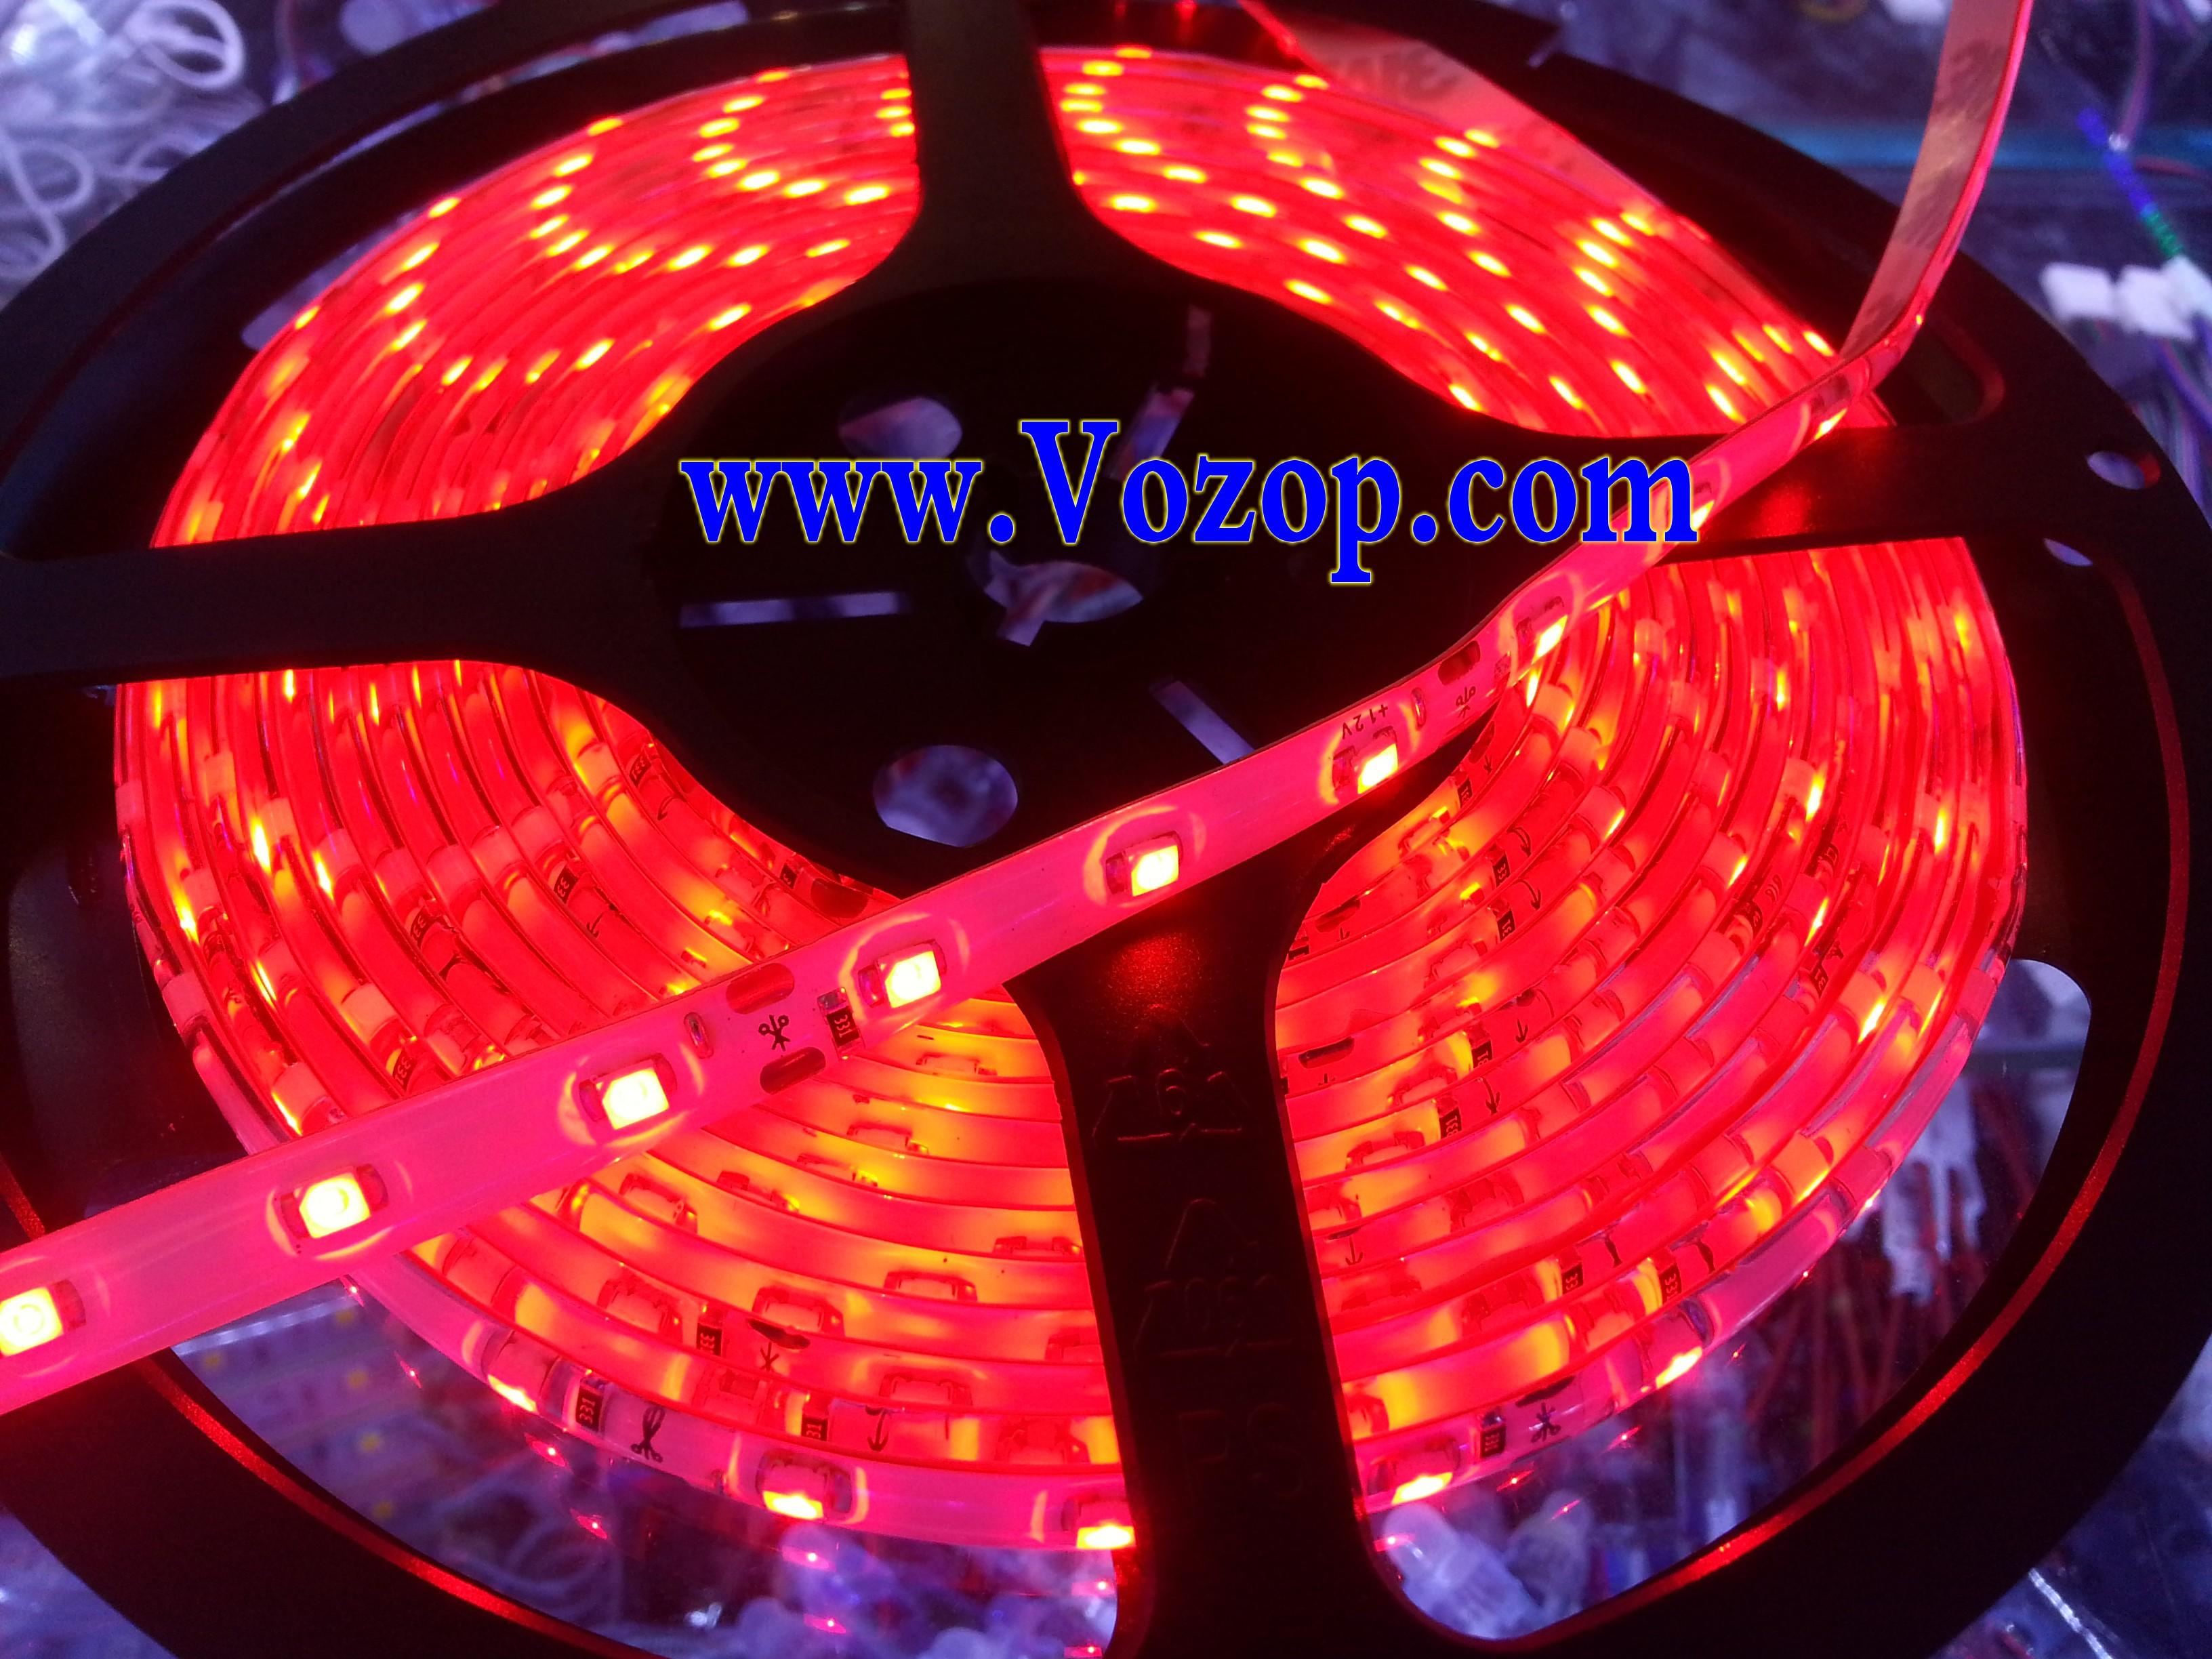 16.4_Feet_red_LED_Light_5M_300_SMD_3528_LEDs_Waterproof_Lights